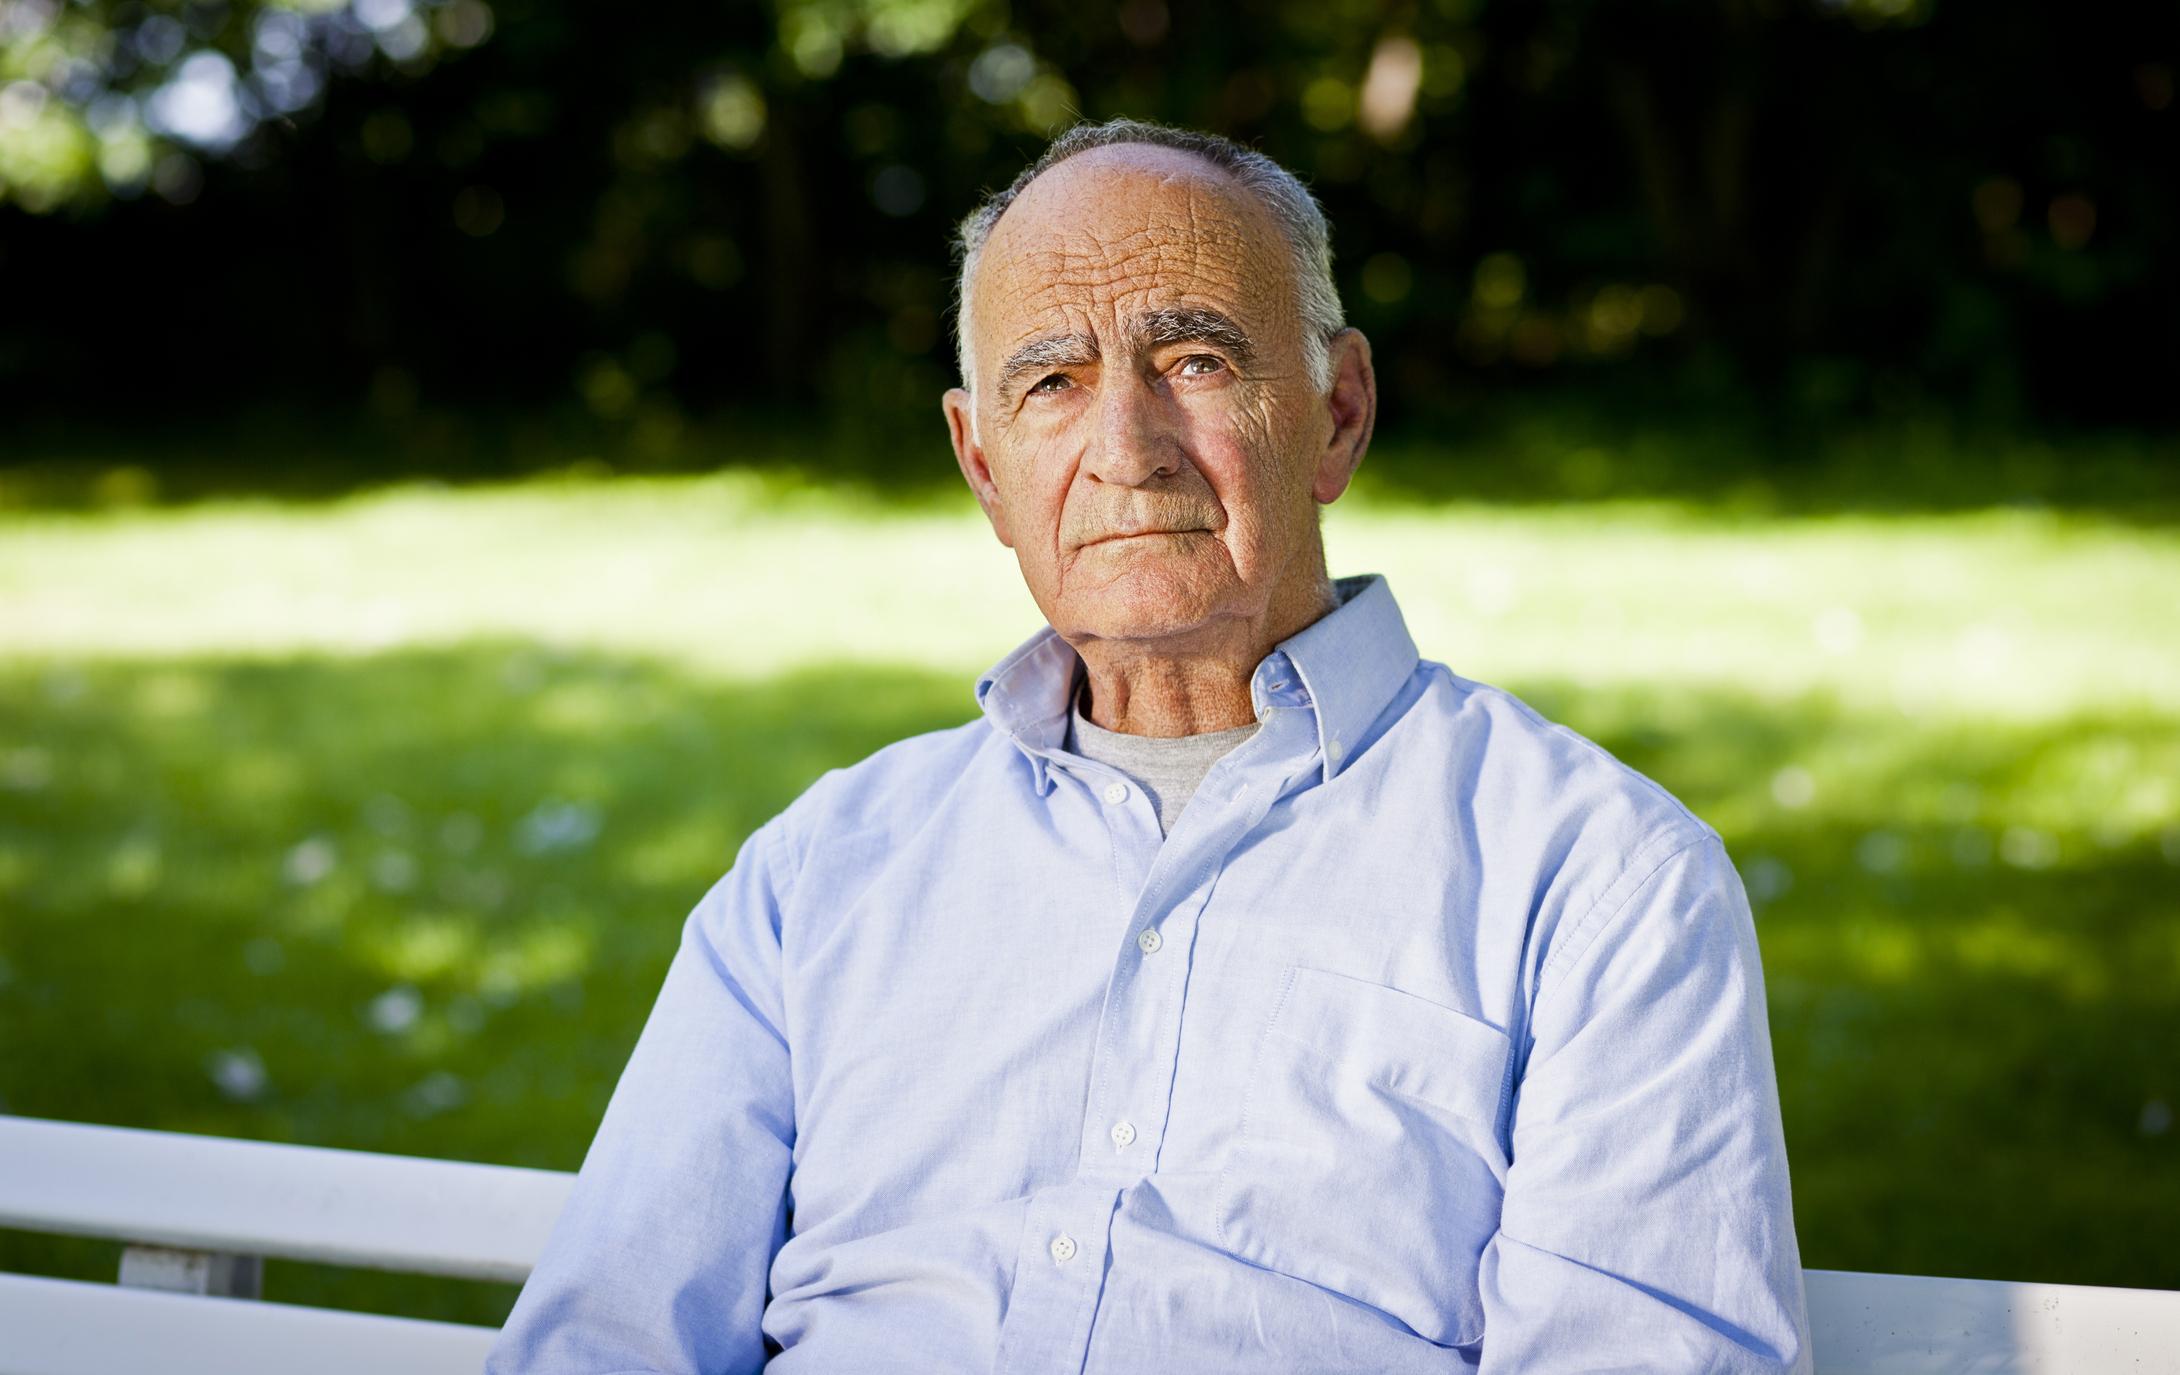 Somber senior man sitting on a bench